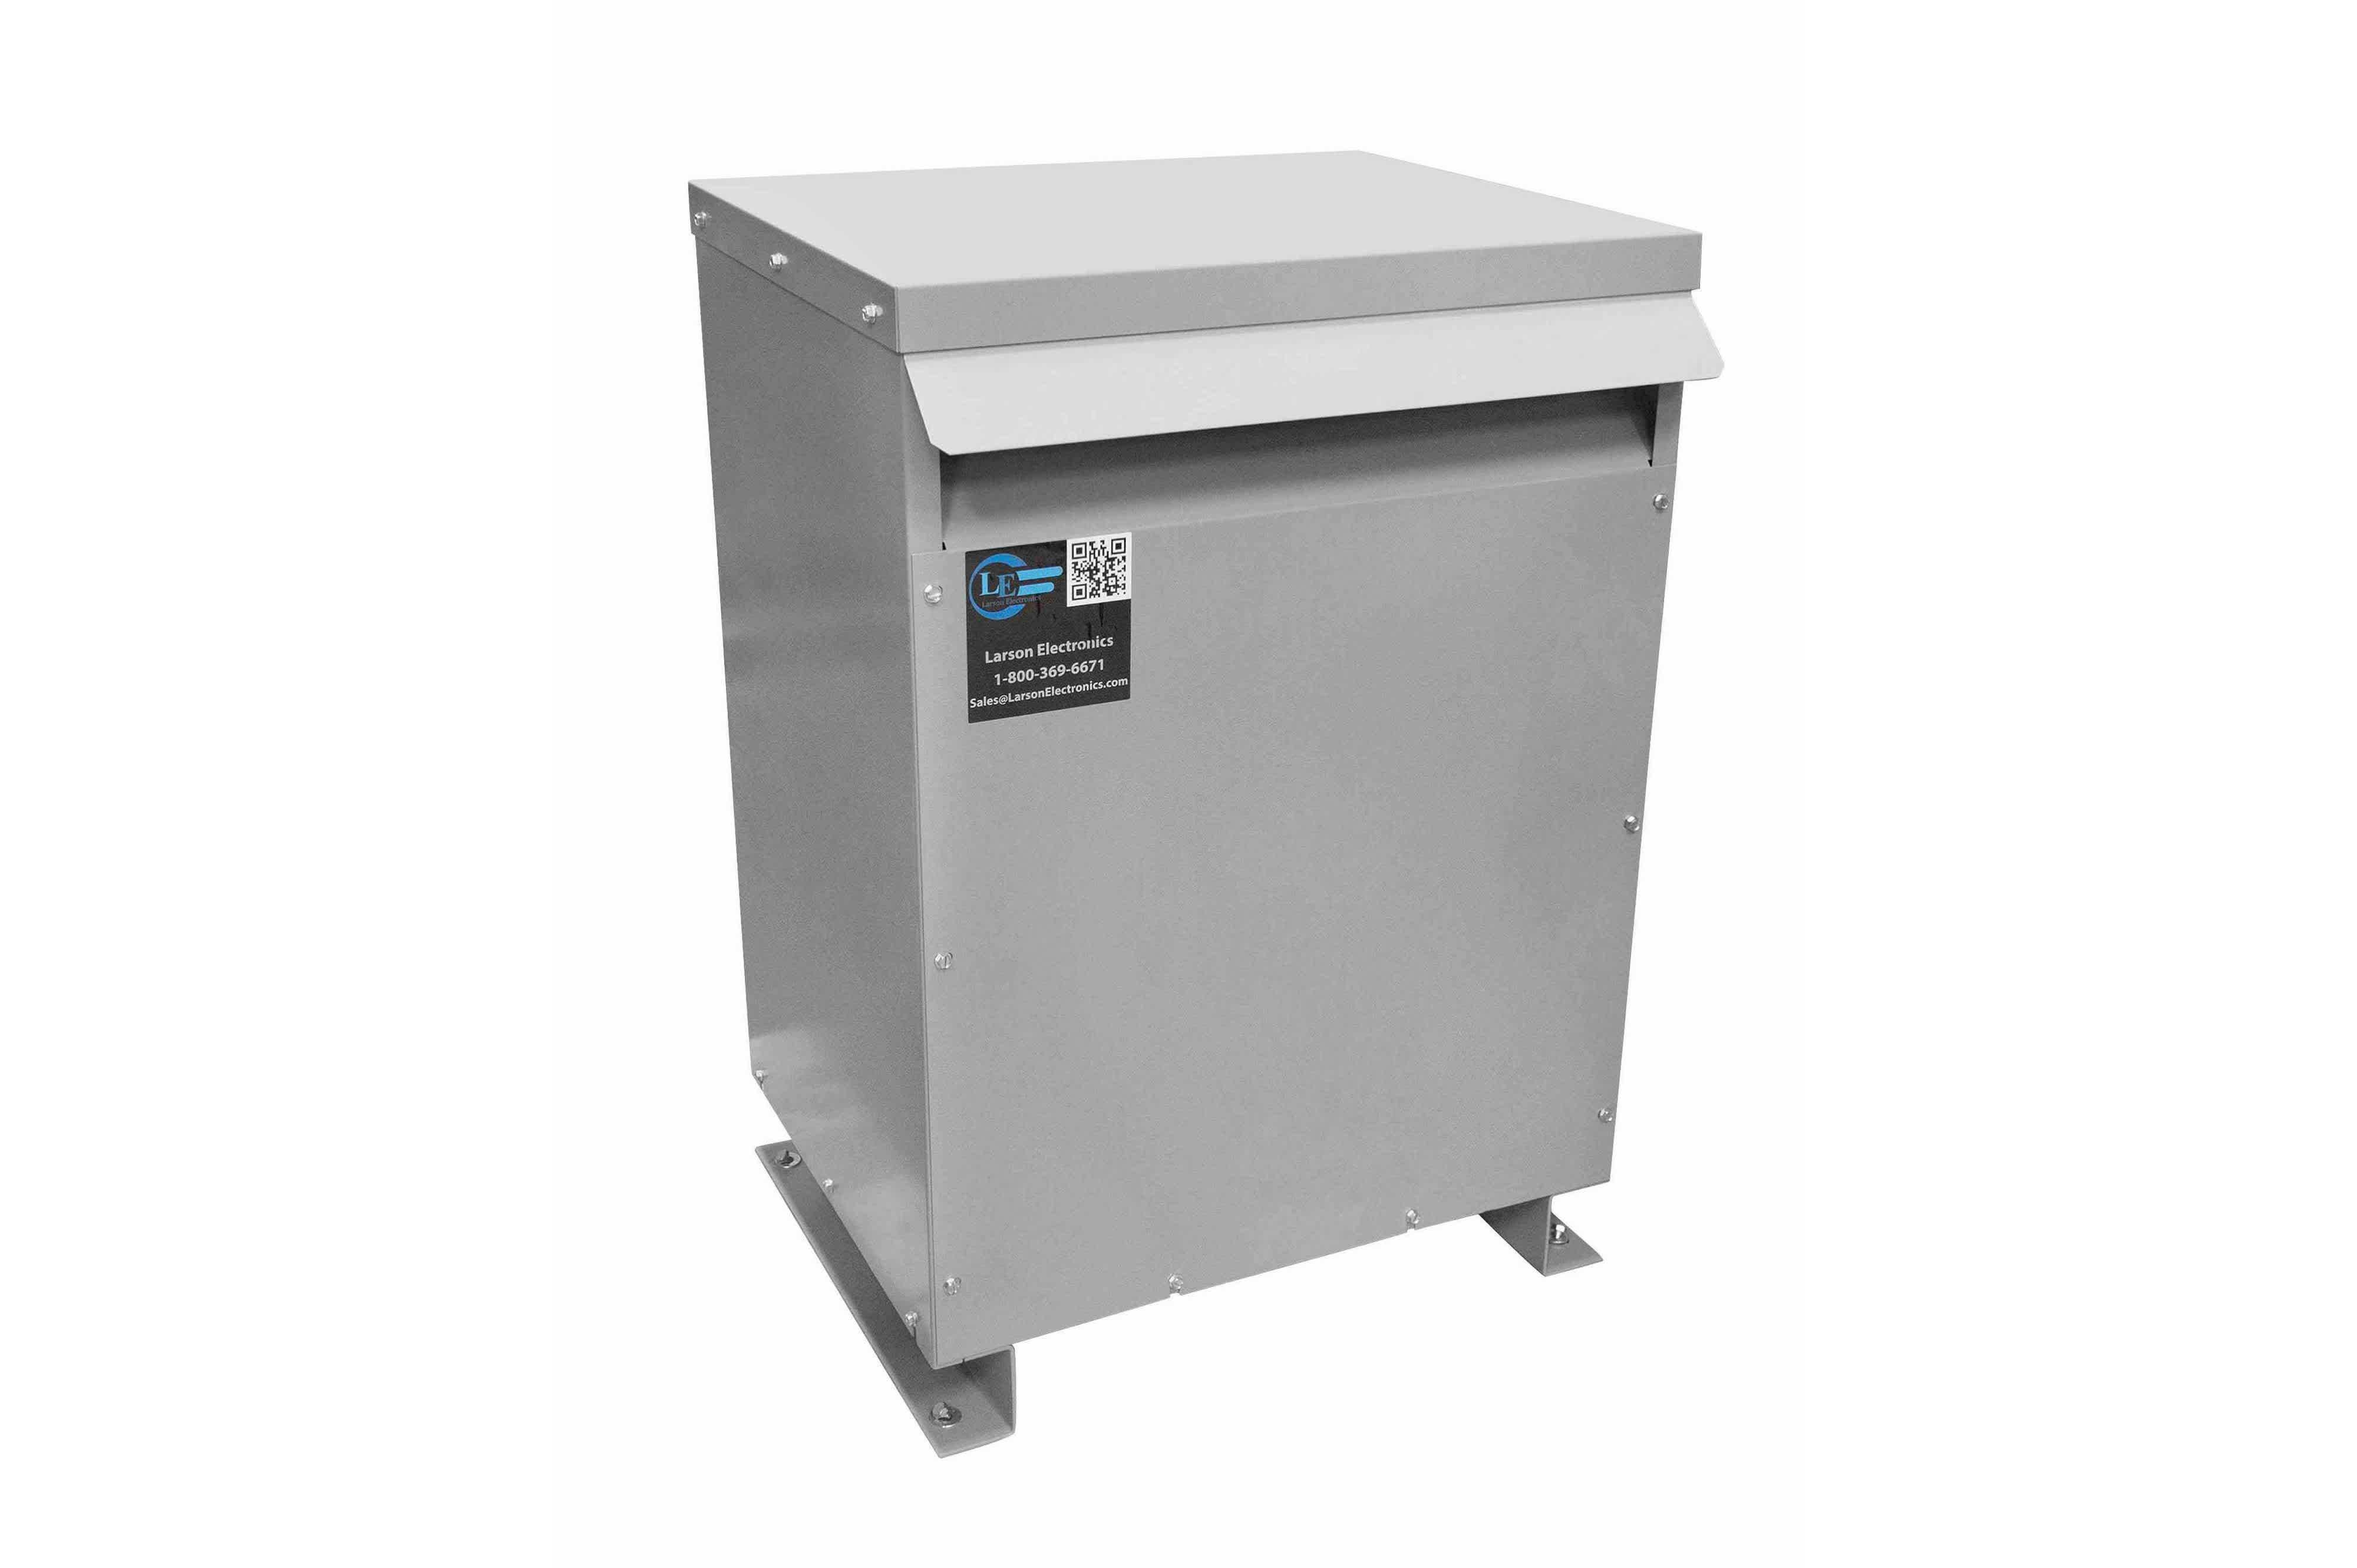 26 kVA 3PH Isolation Transformer, 575V Wye Primary, 240V Delta Secondary, N3R, Ventilated, 60 Hz